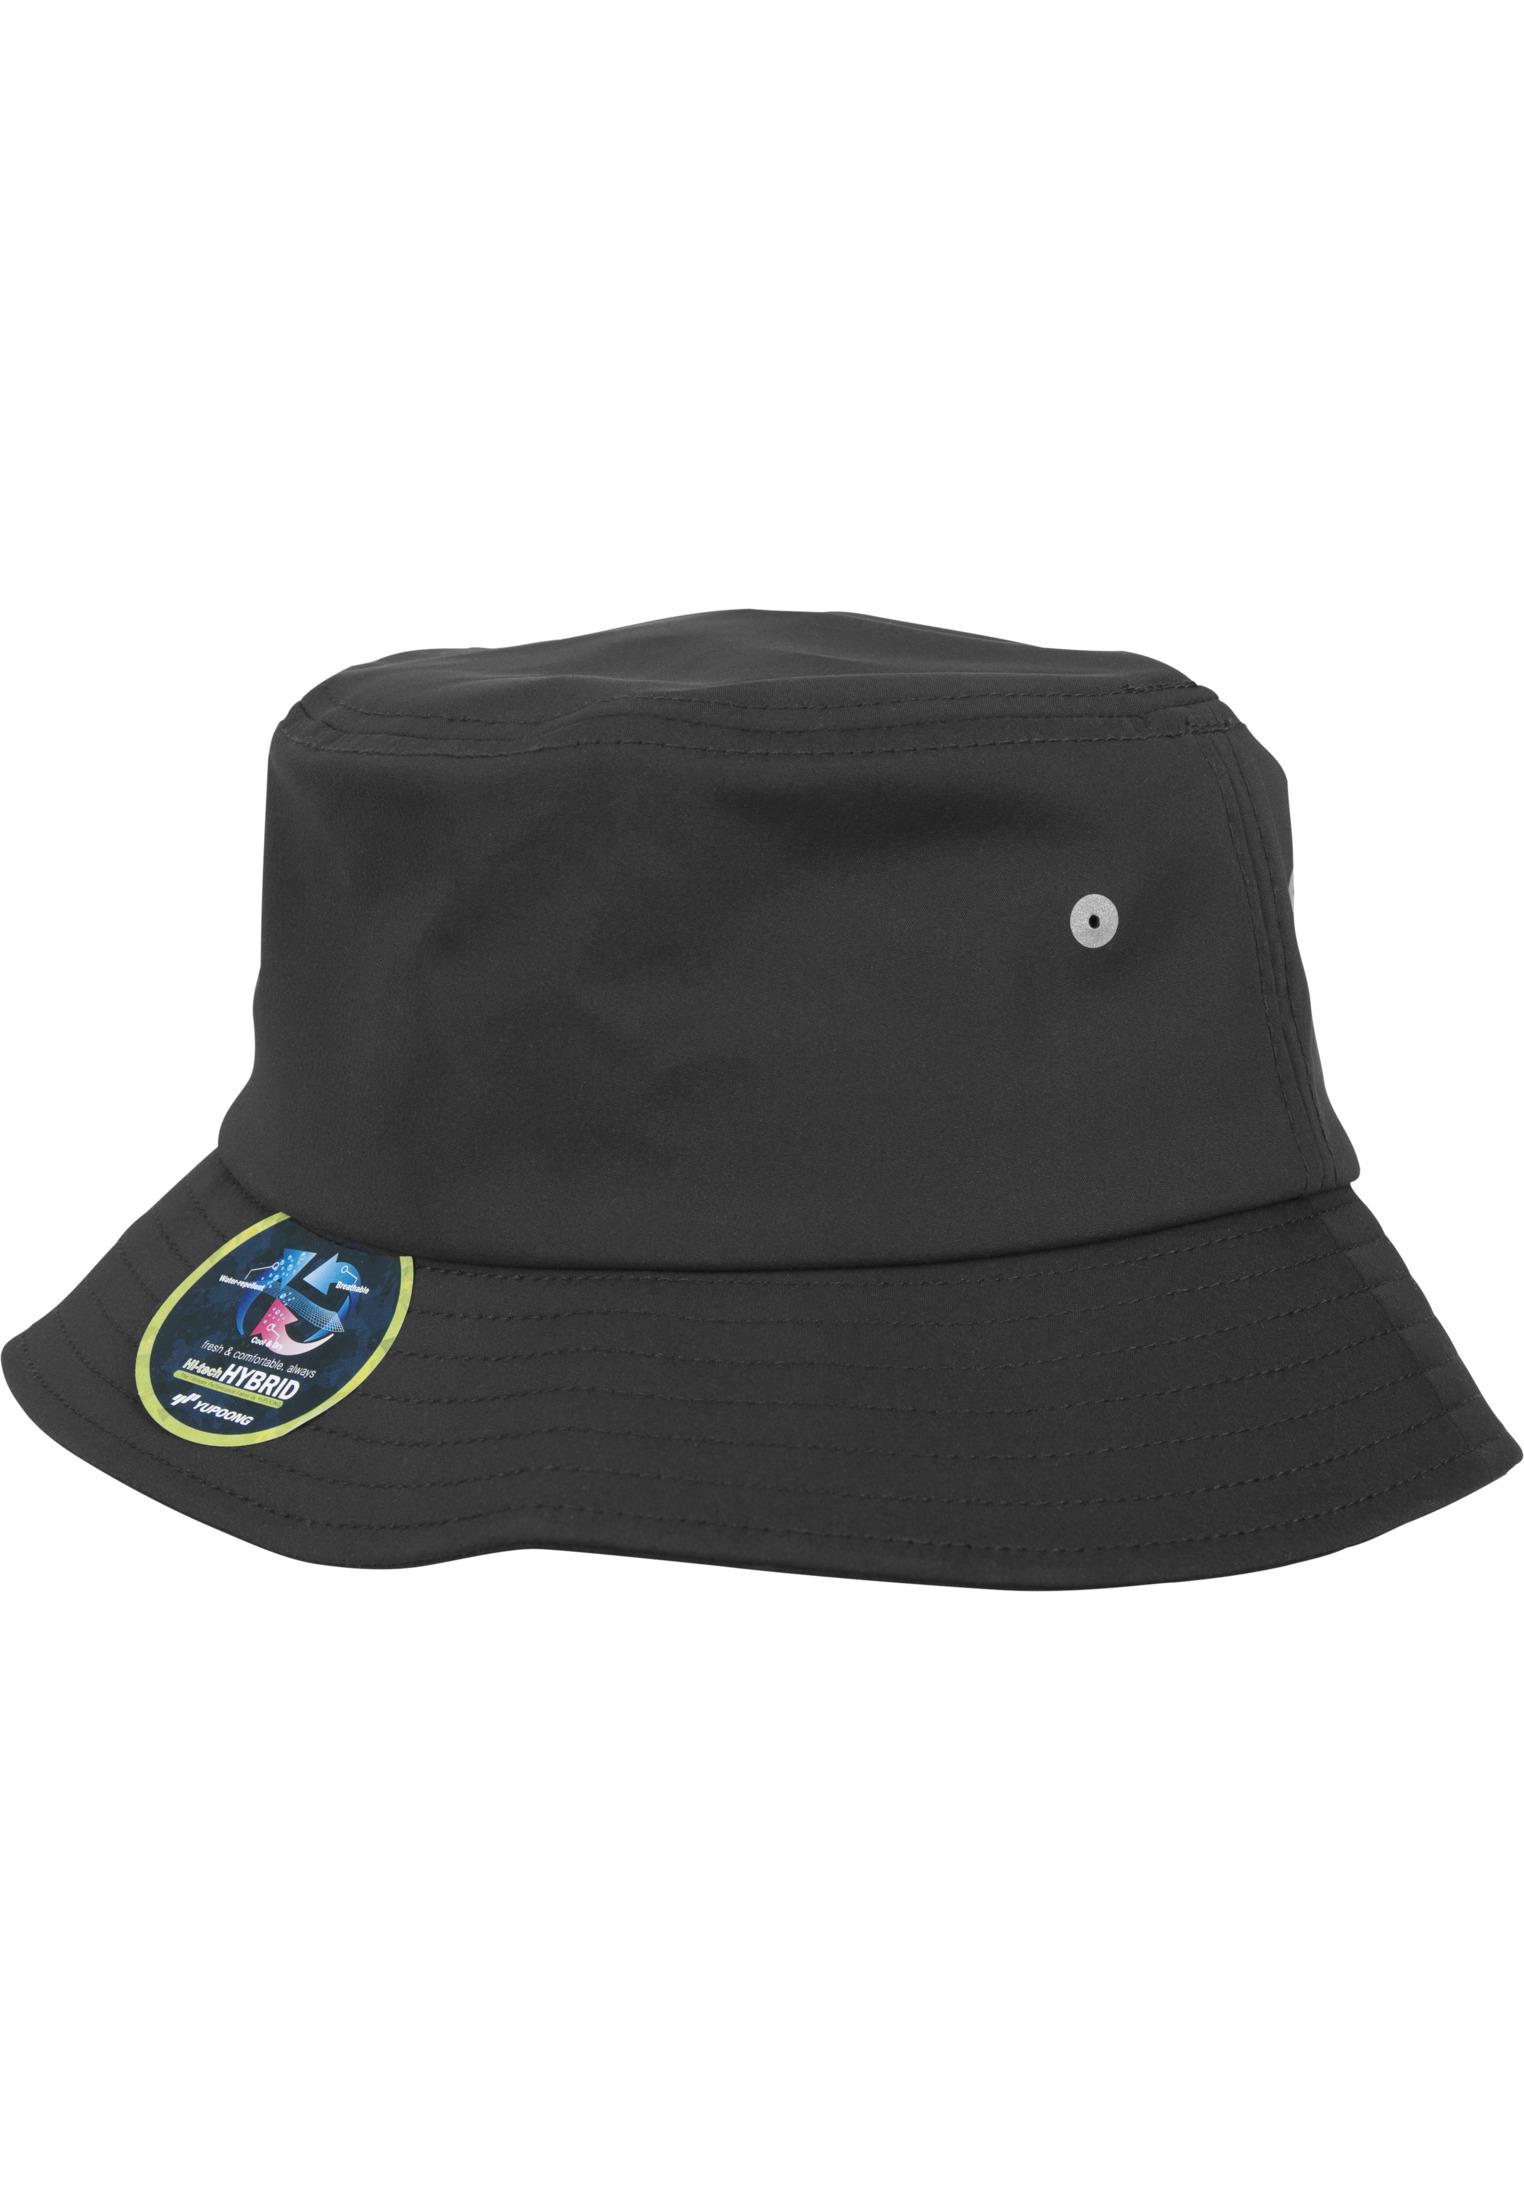 Nylon Bucket Hat 5003n